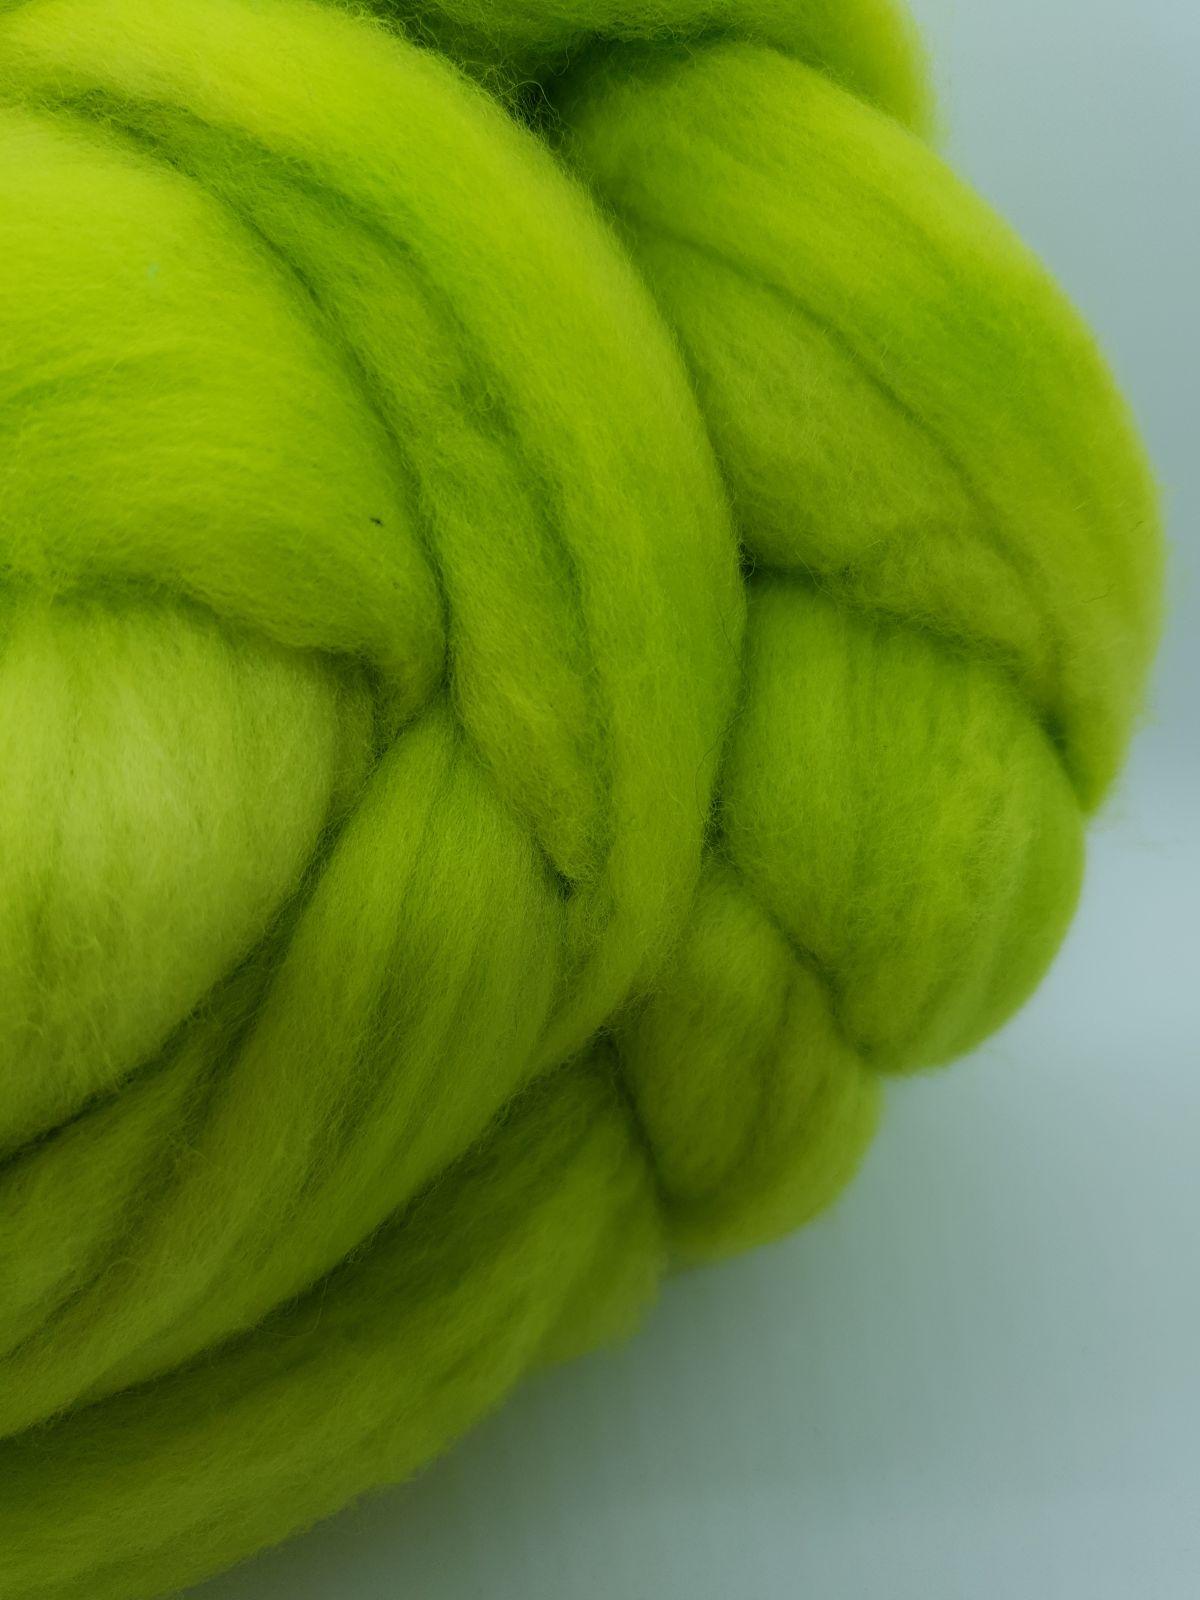 Slime Lime roving